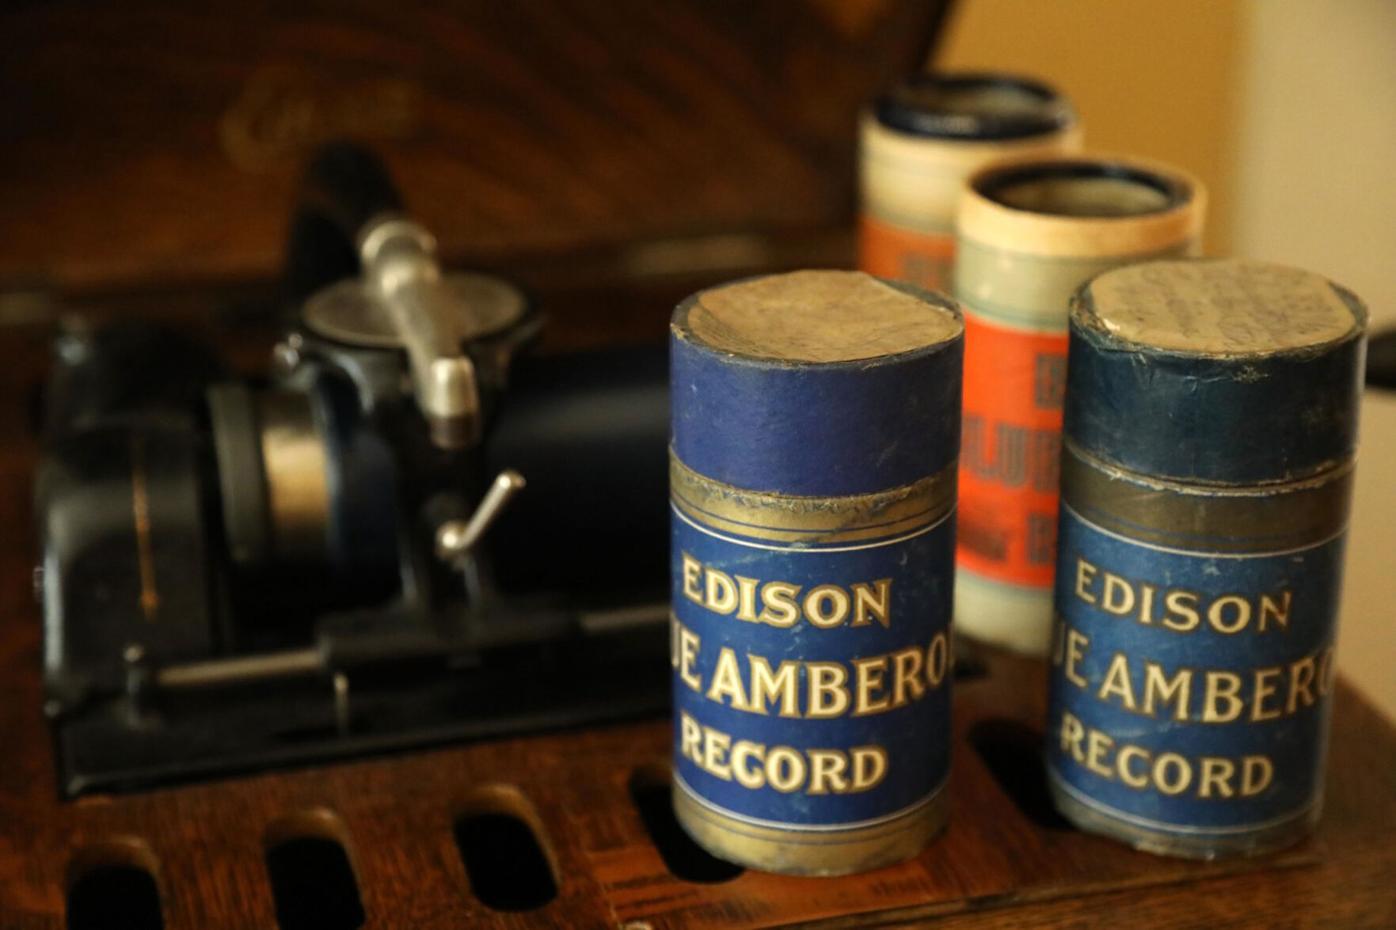 Edison Blue Amberol cylinder records